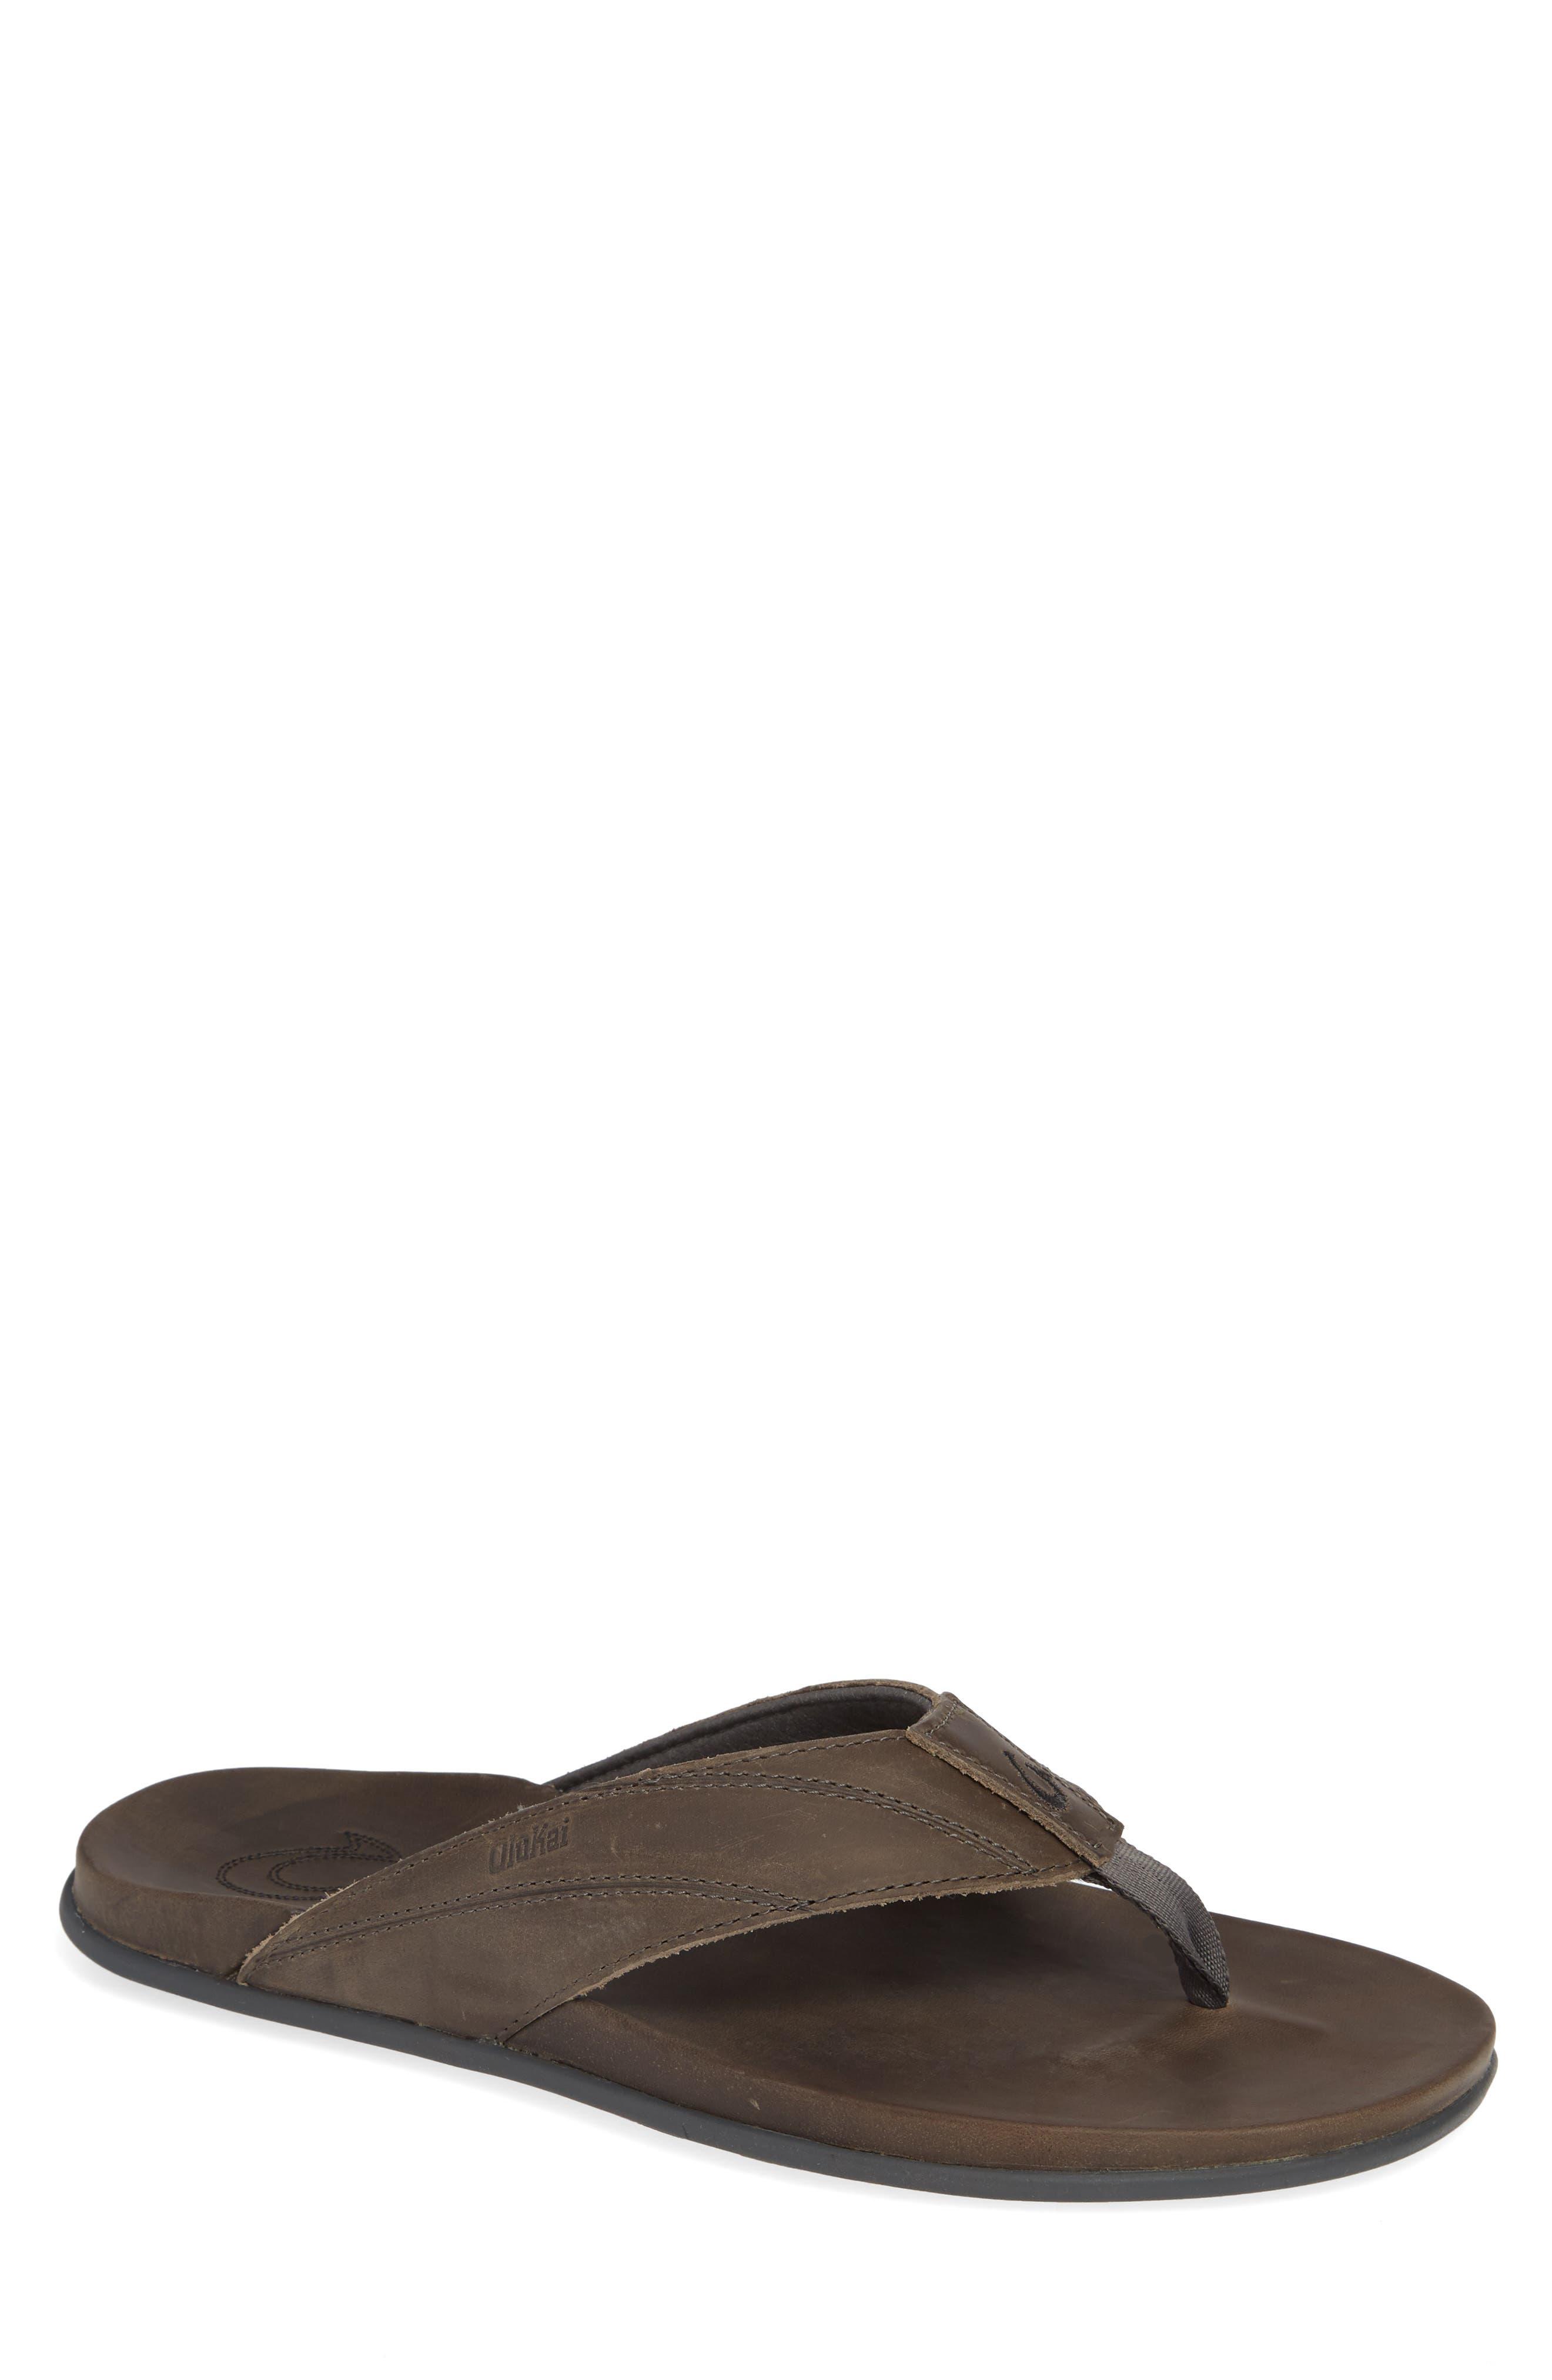 Pikoi Flip Flop,                         Main,                         color, Storm Grey/ Storm Grey Leather